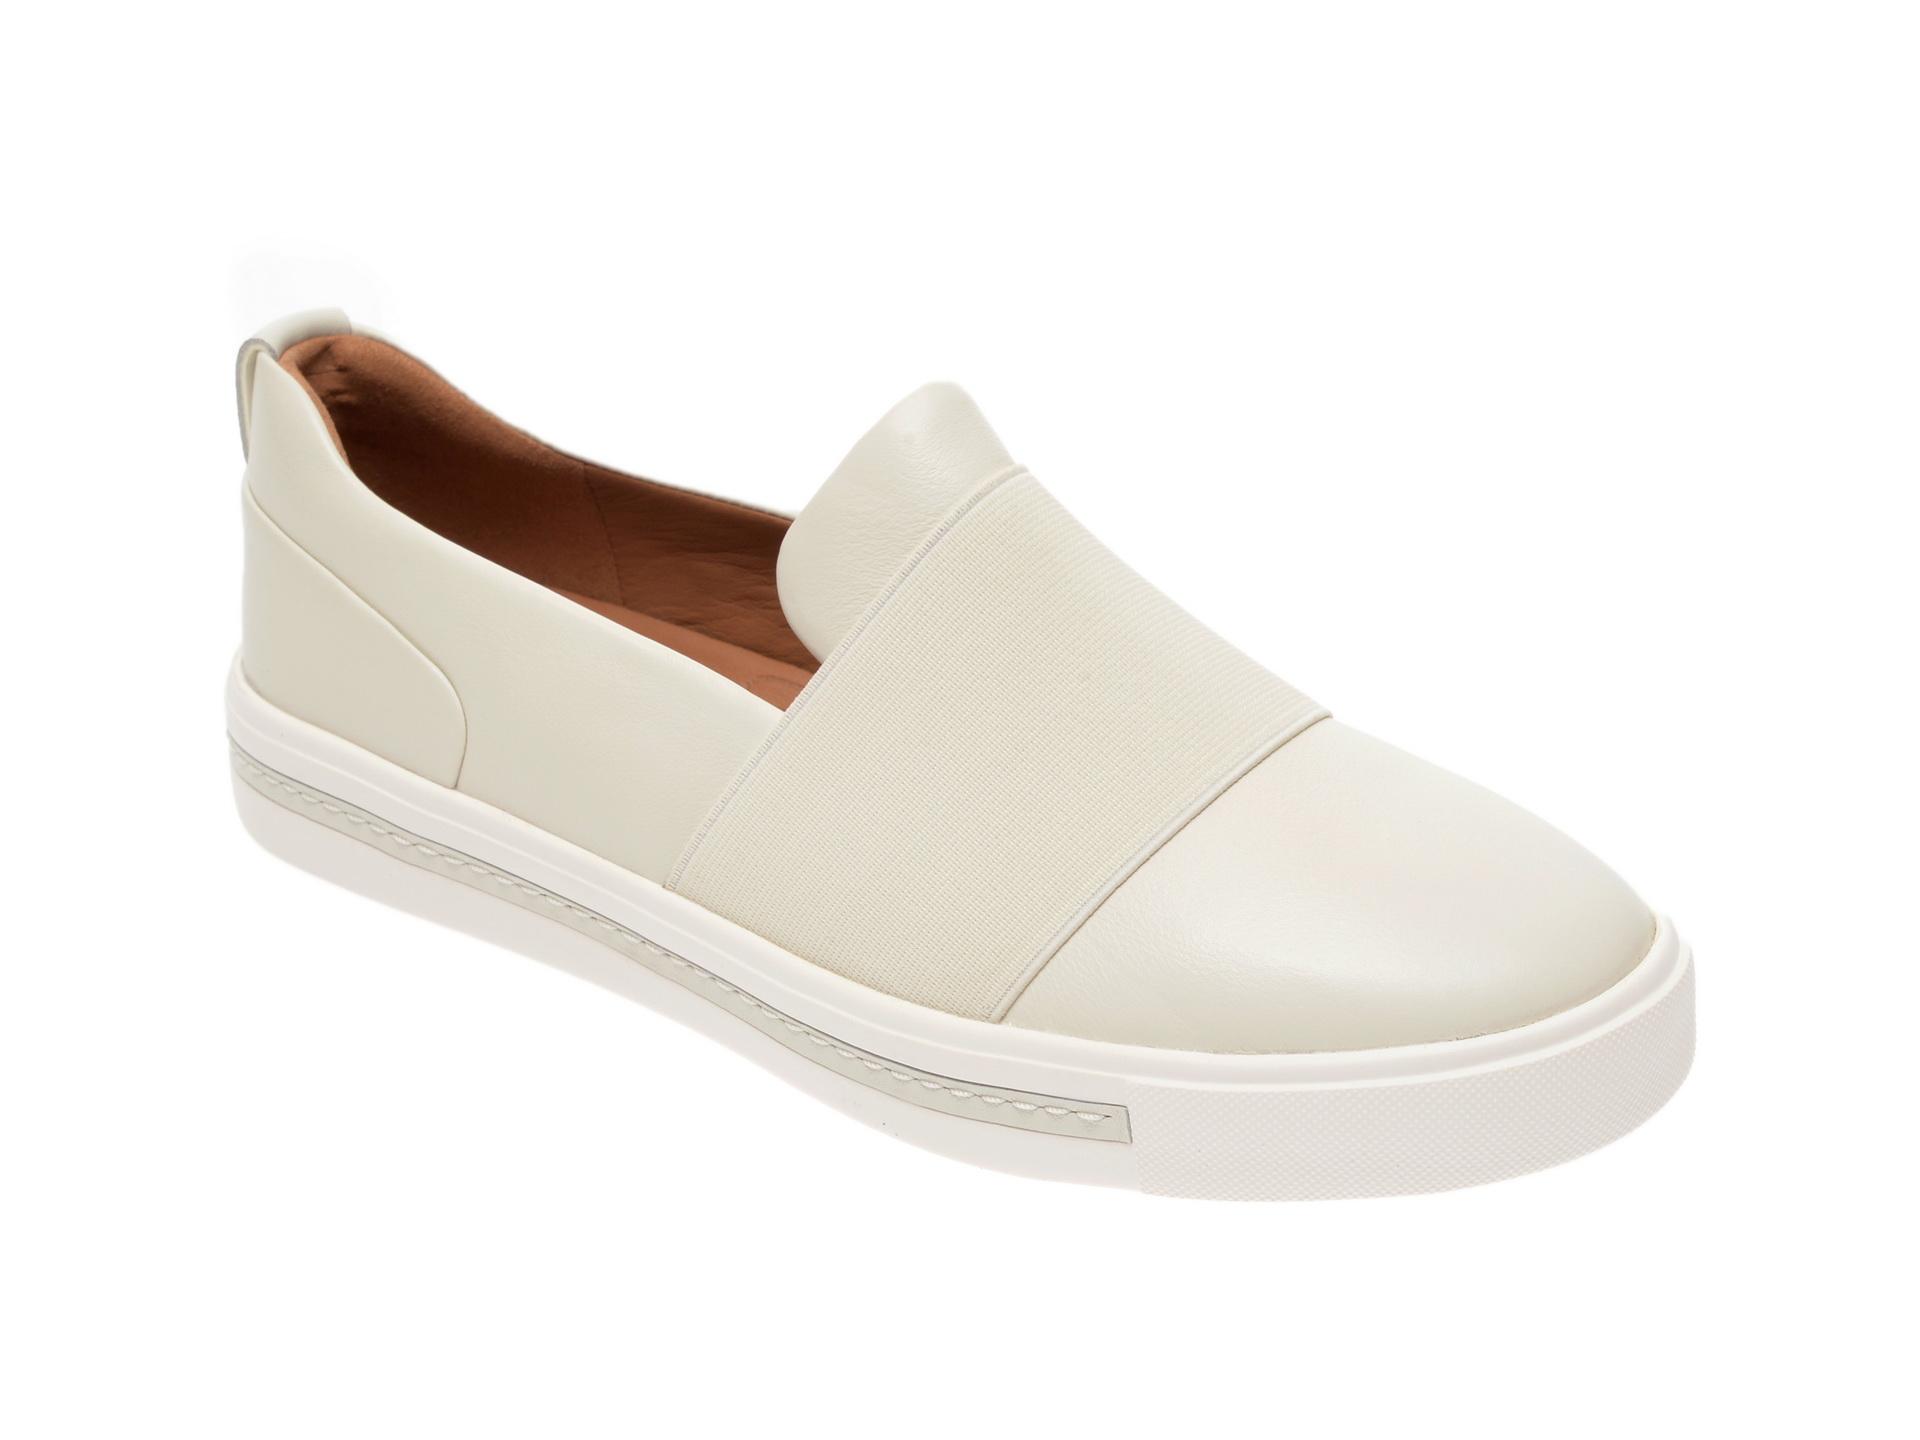 Pantofi sport CLARKS albi, Sift Lace, din material textil si piele naturala